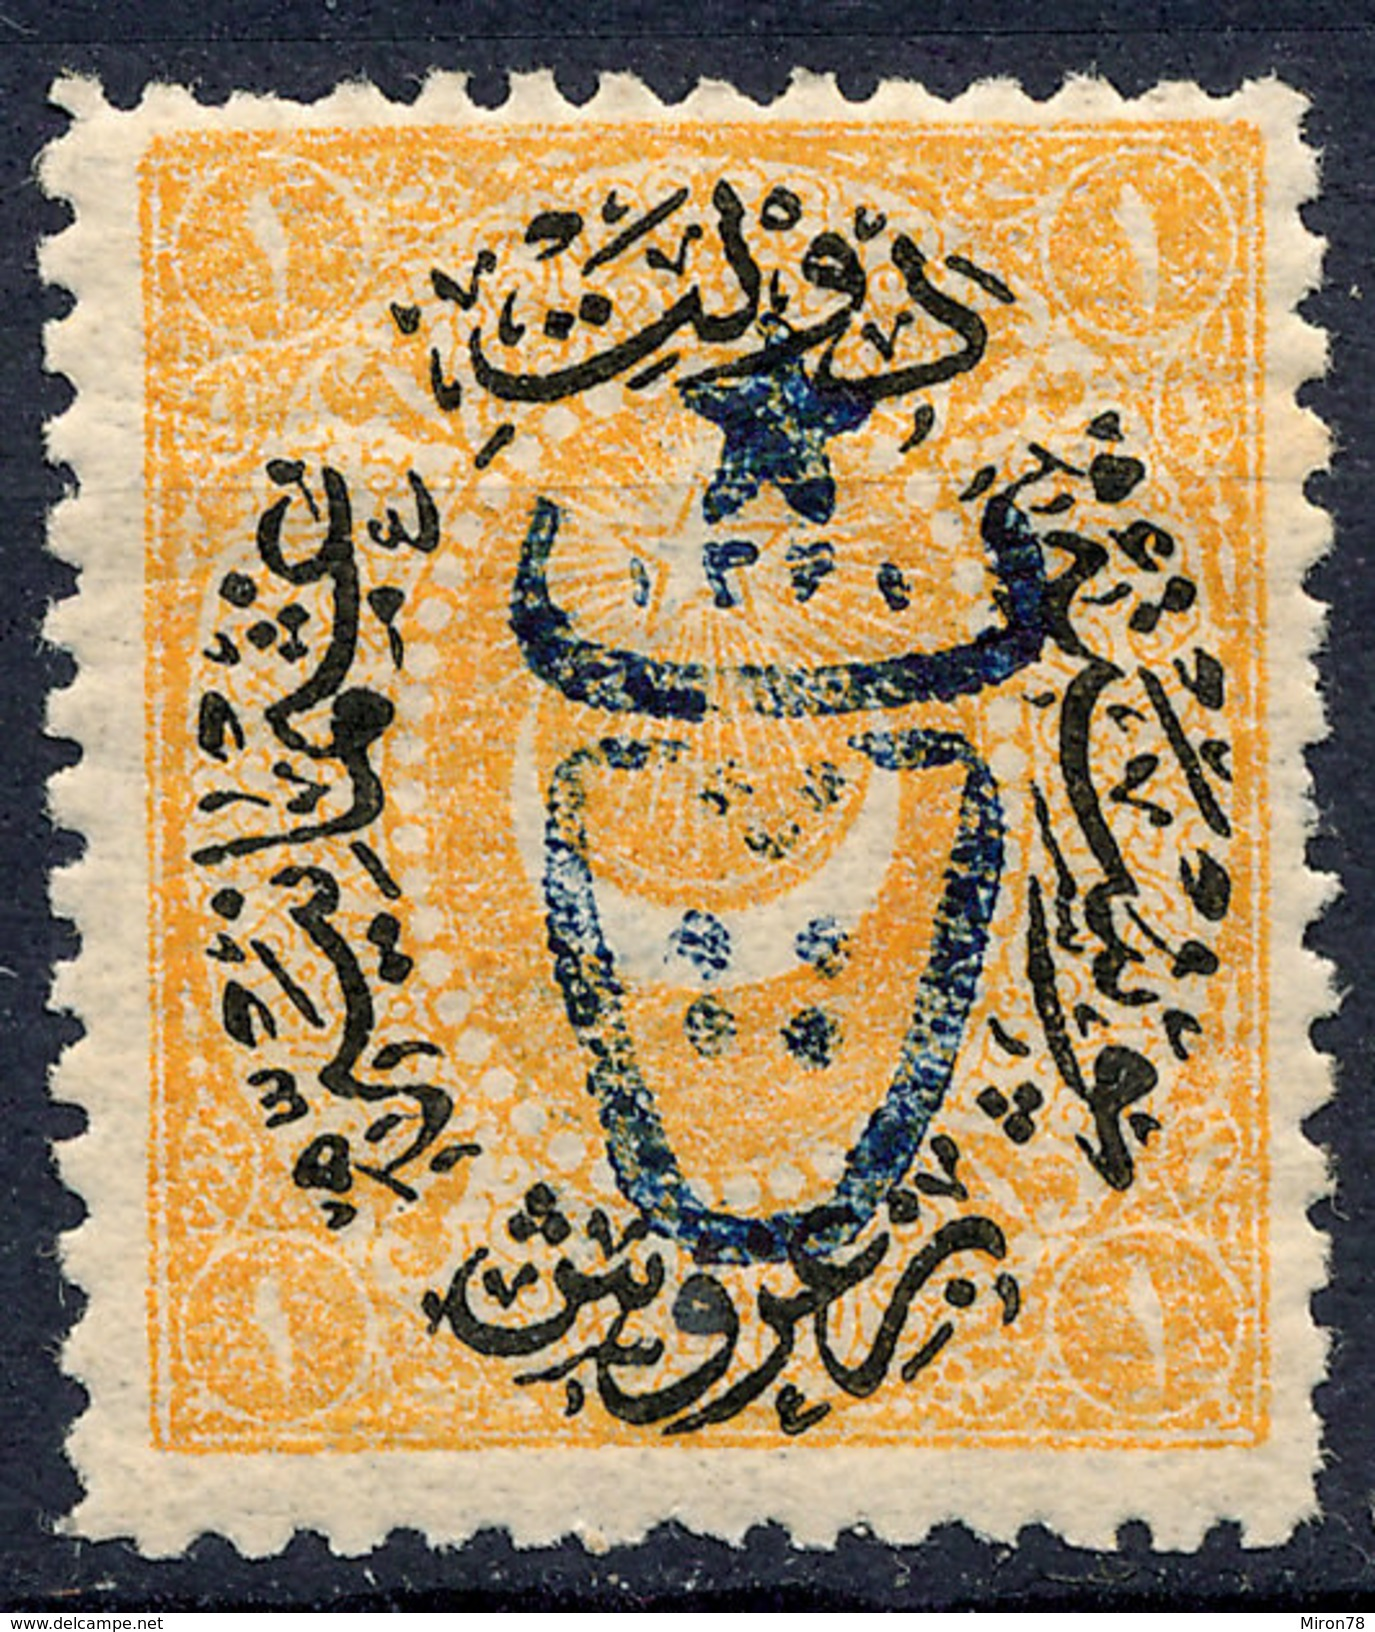 Stamp Turkey Overprint  Lot#54 - 1858-1921 Empire Ottoman